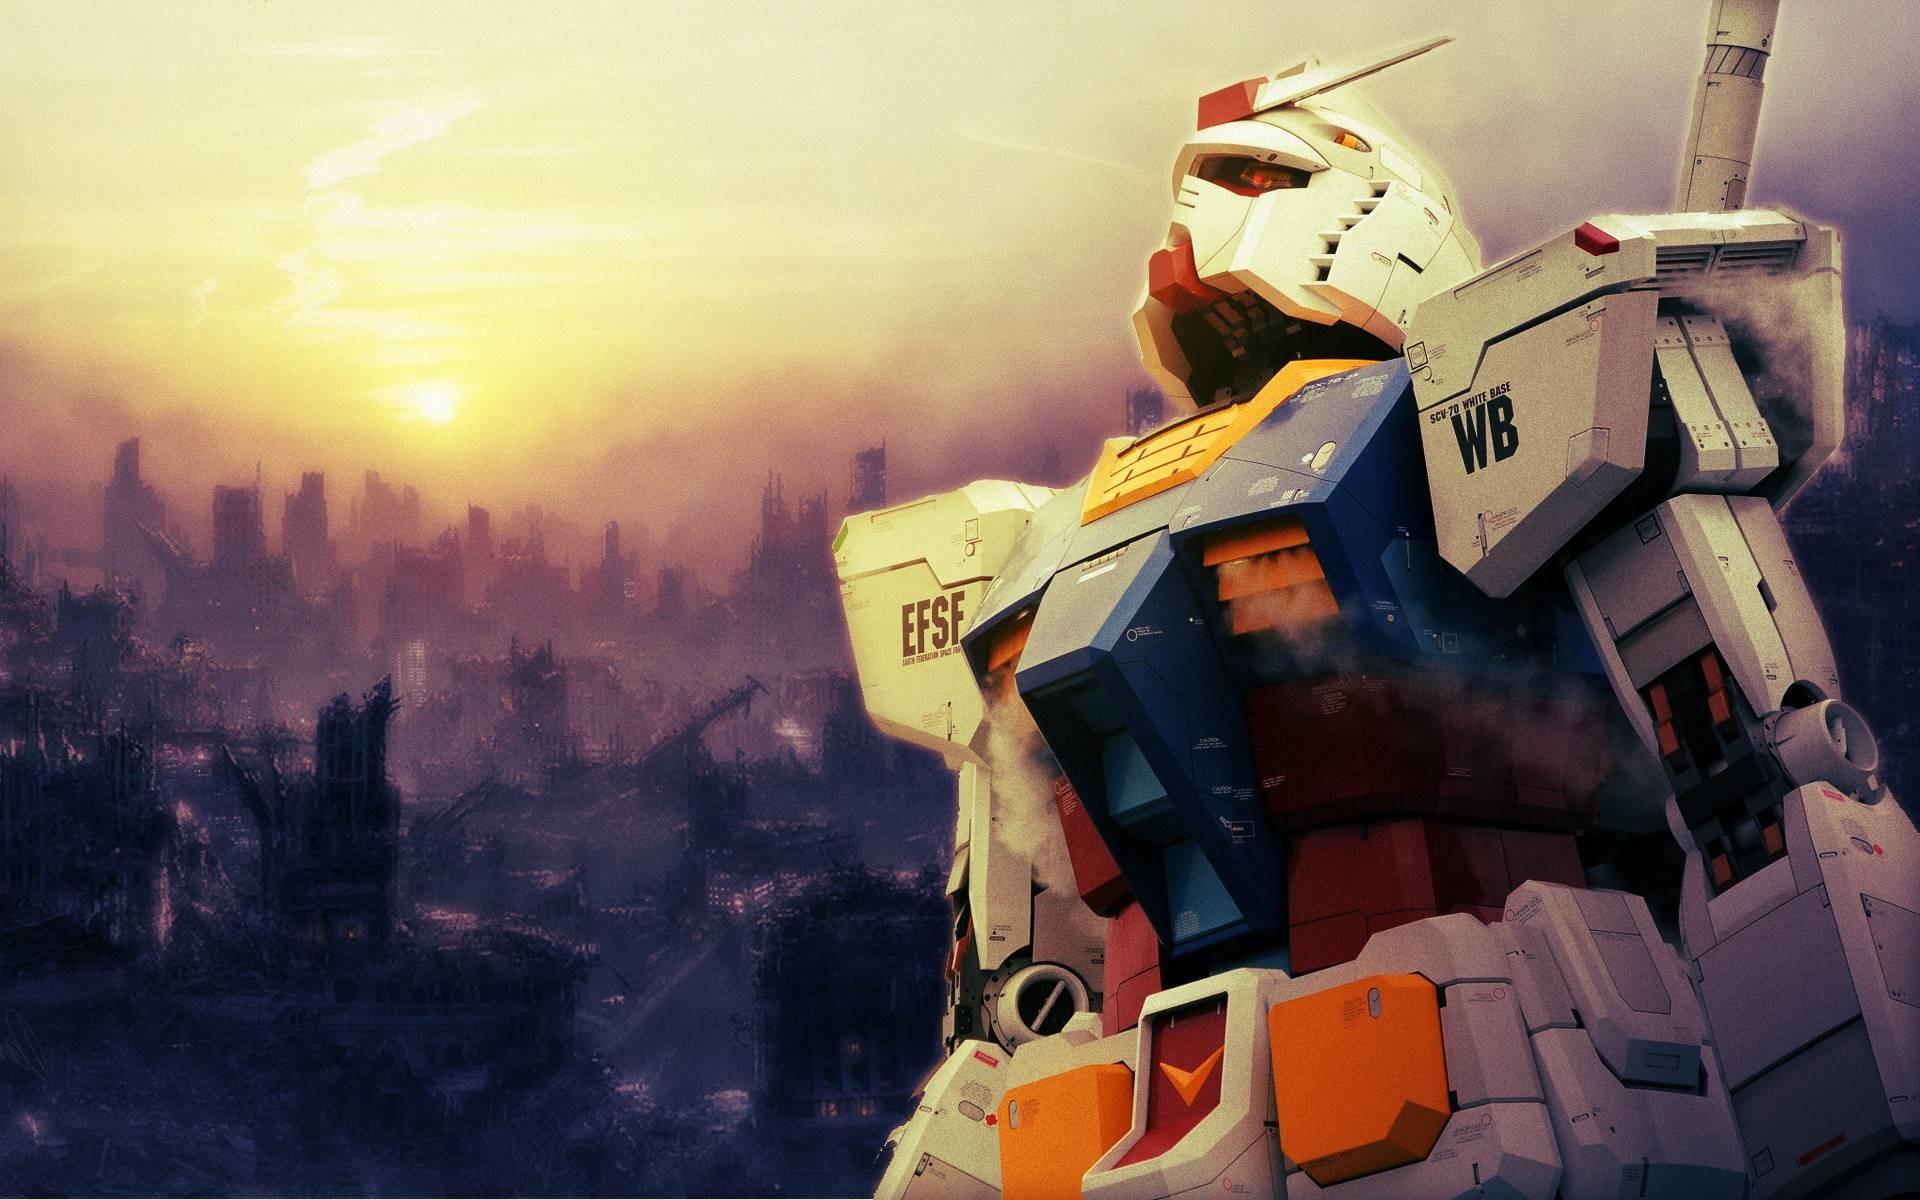 Gundam Wallpapers – Full HD wallpaper search